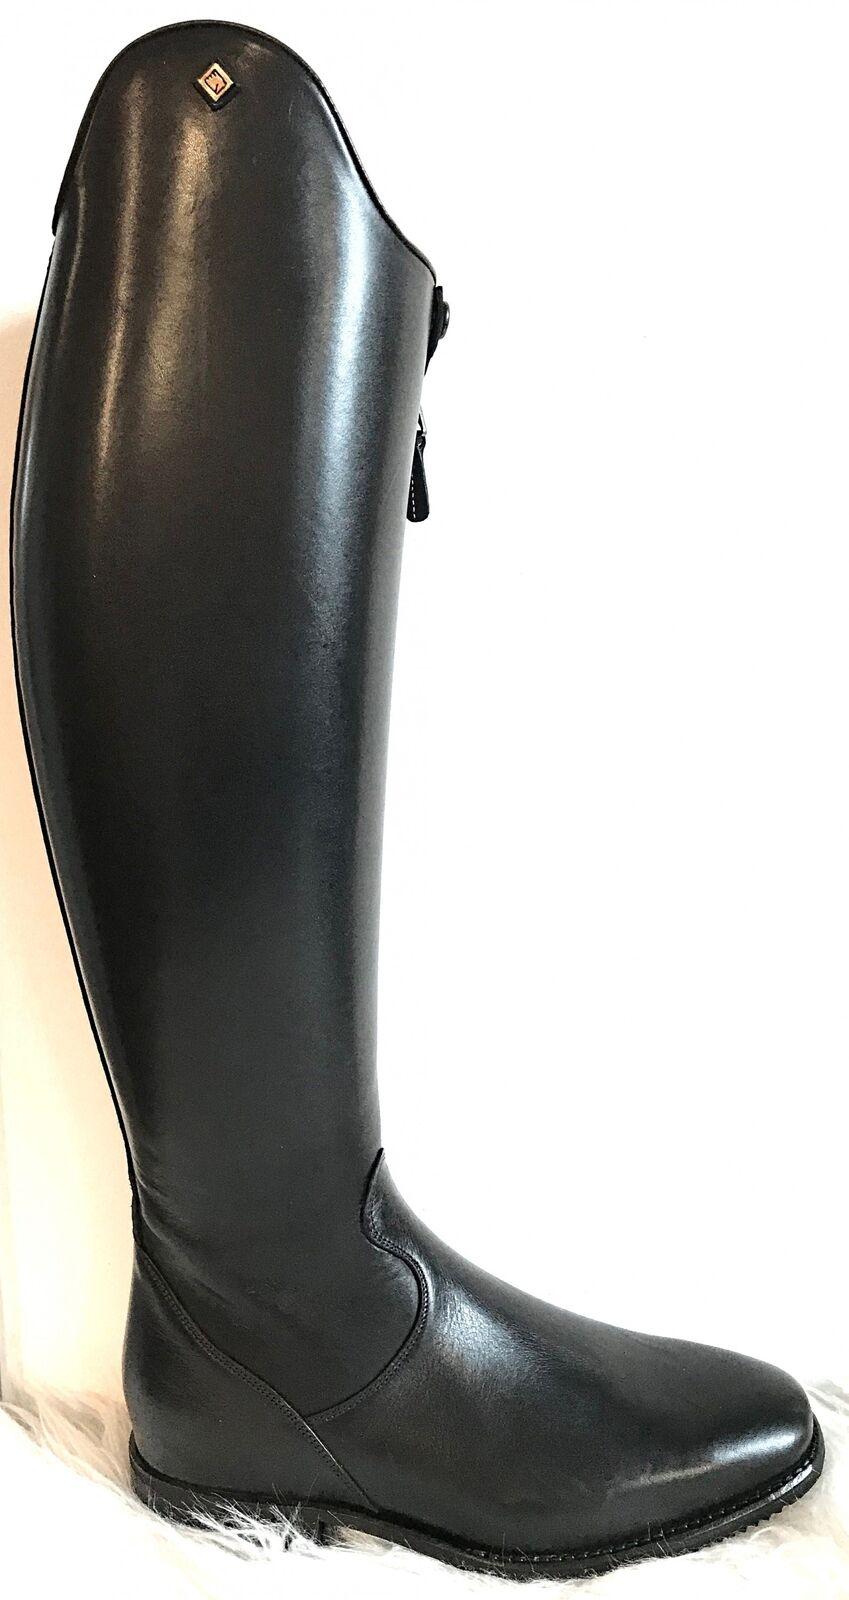 Niro MONTALA Stivali Tiziano NERO 37 MA M tenta Stivali